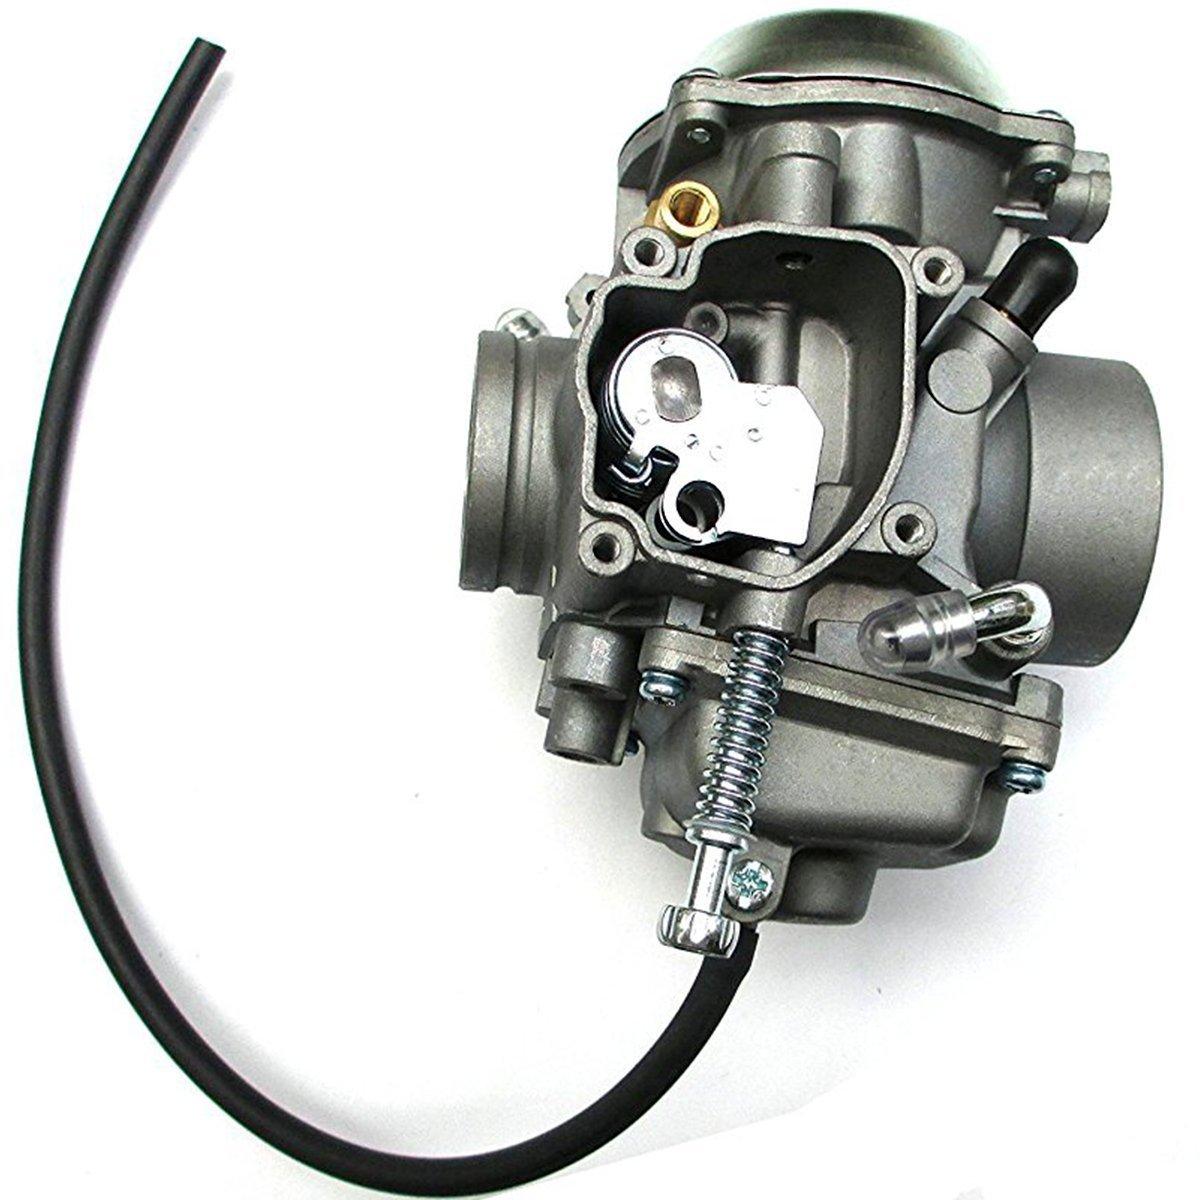 New Carburetor for Polaris Sportsman 500 6x6 2001-2008 /& Magnum 425 Carburetor 2x4 4x4 1995-1998 ATV Quad Carb by Amhousejoy